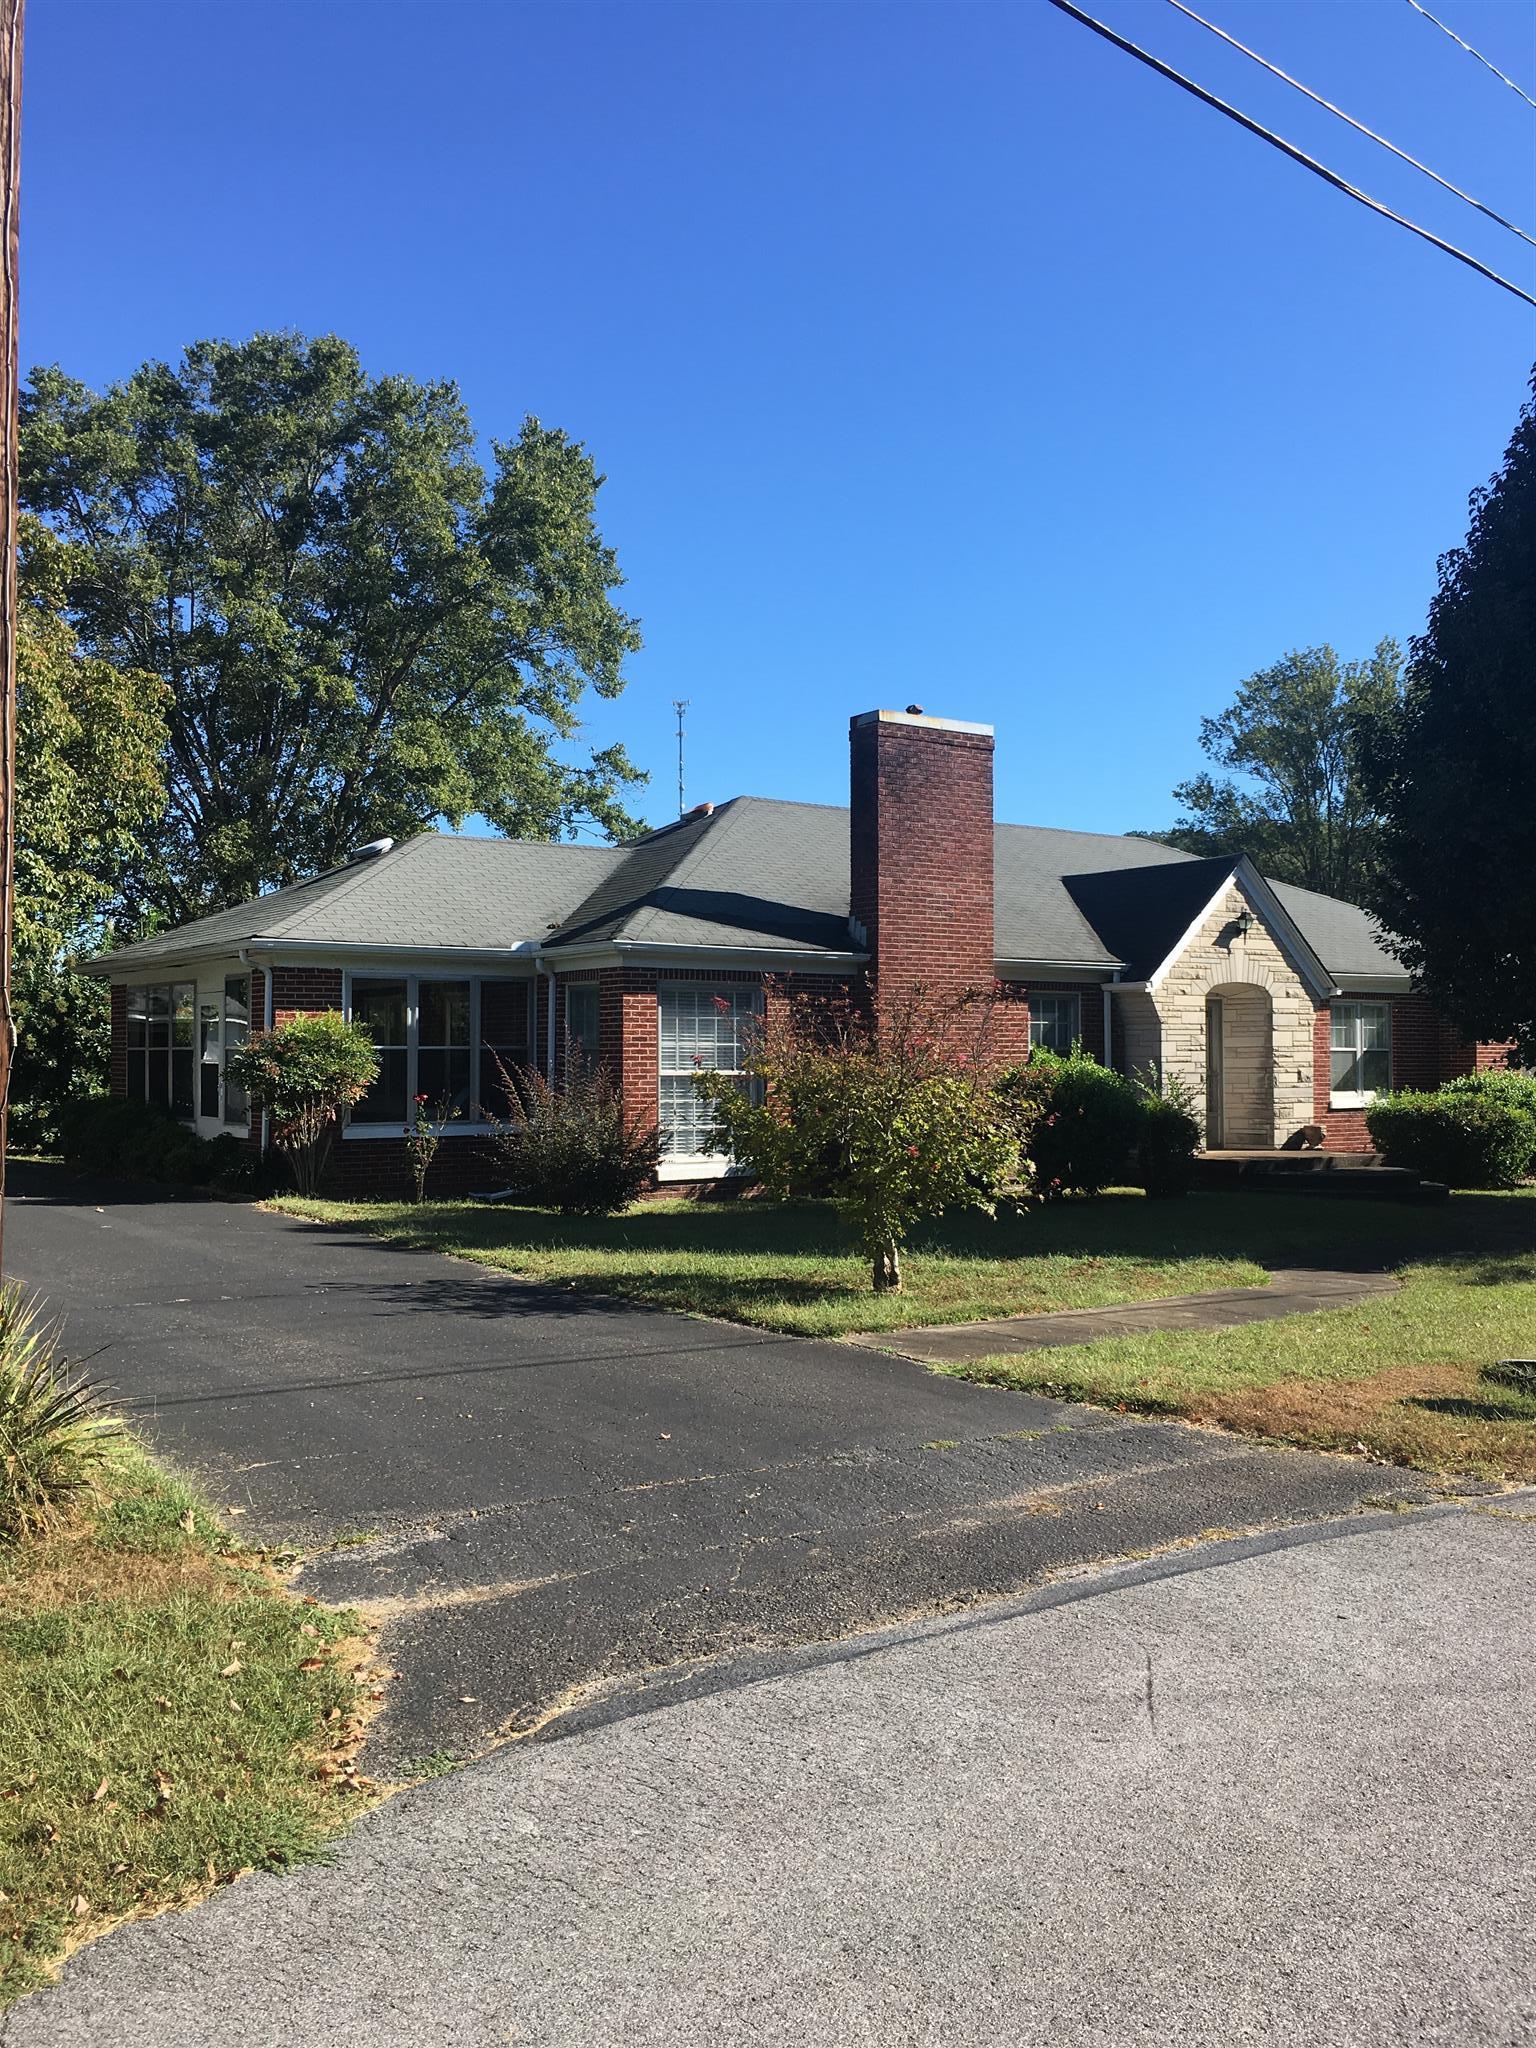 125 E. Frank Boyd St, Waynesboro, TN 38485 - Waynesboro, TN real estate listing